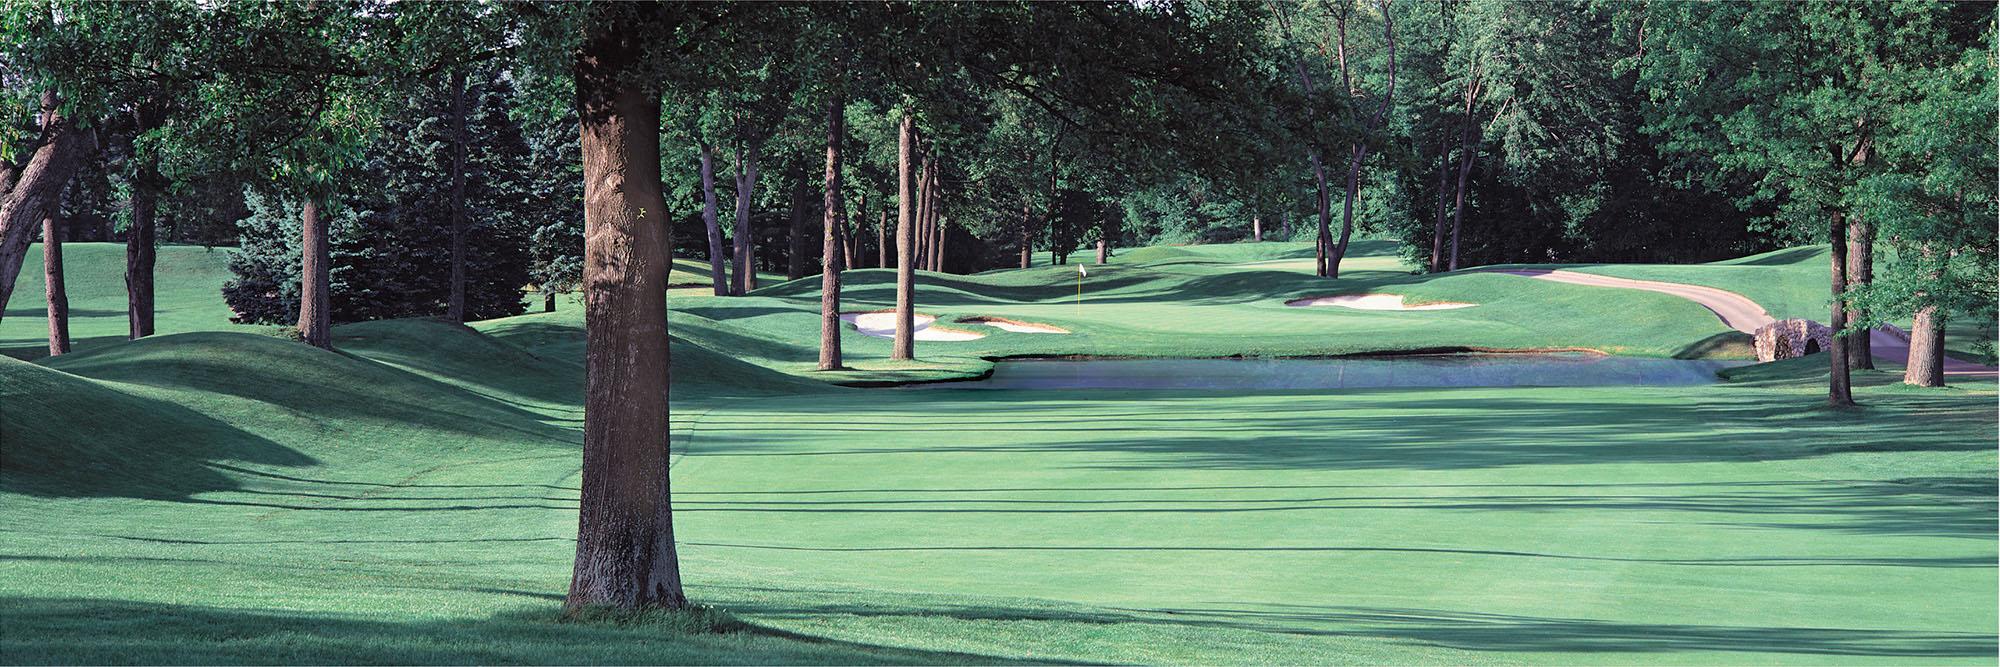 Golf Course Image - Firestone South No. 3